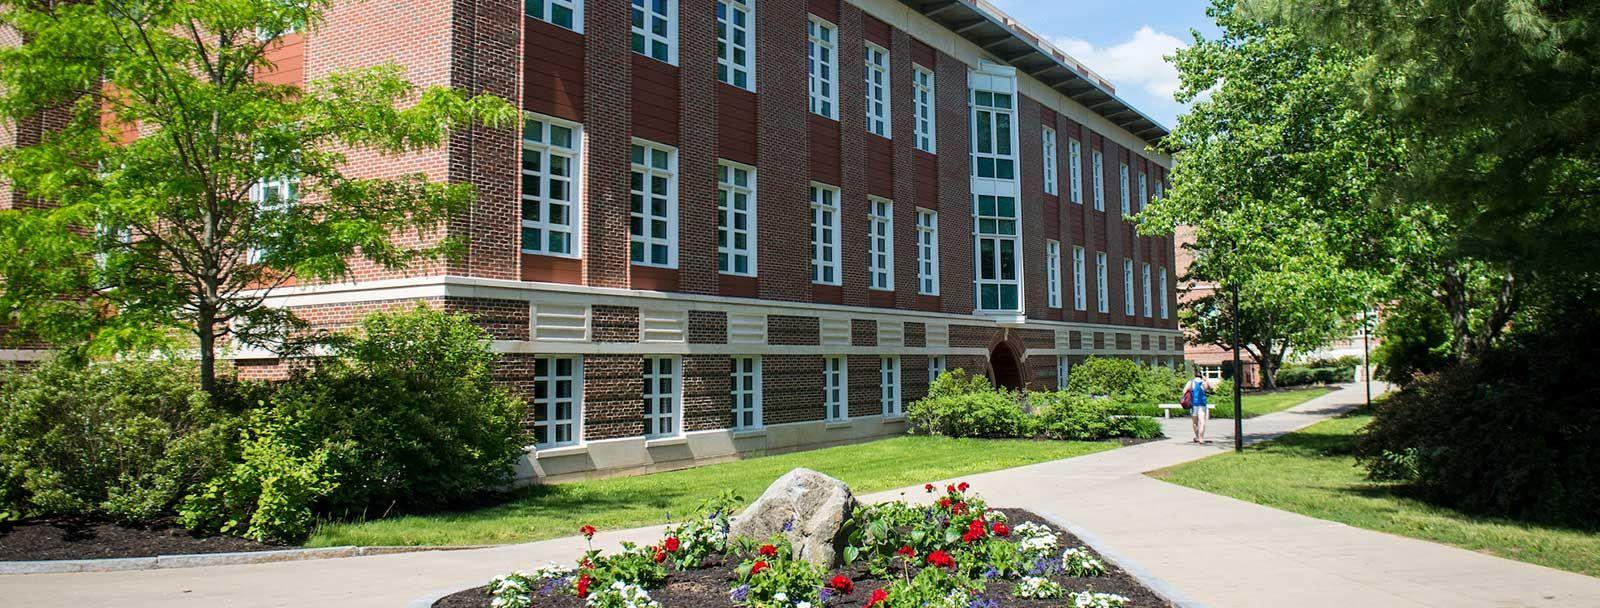 UNH campus in Durham, NH